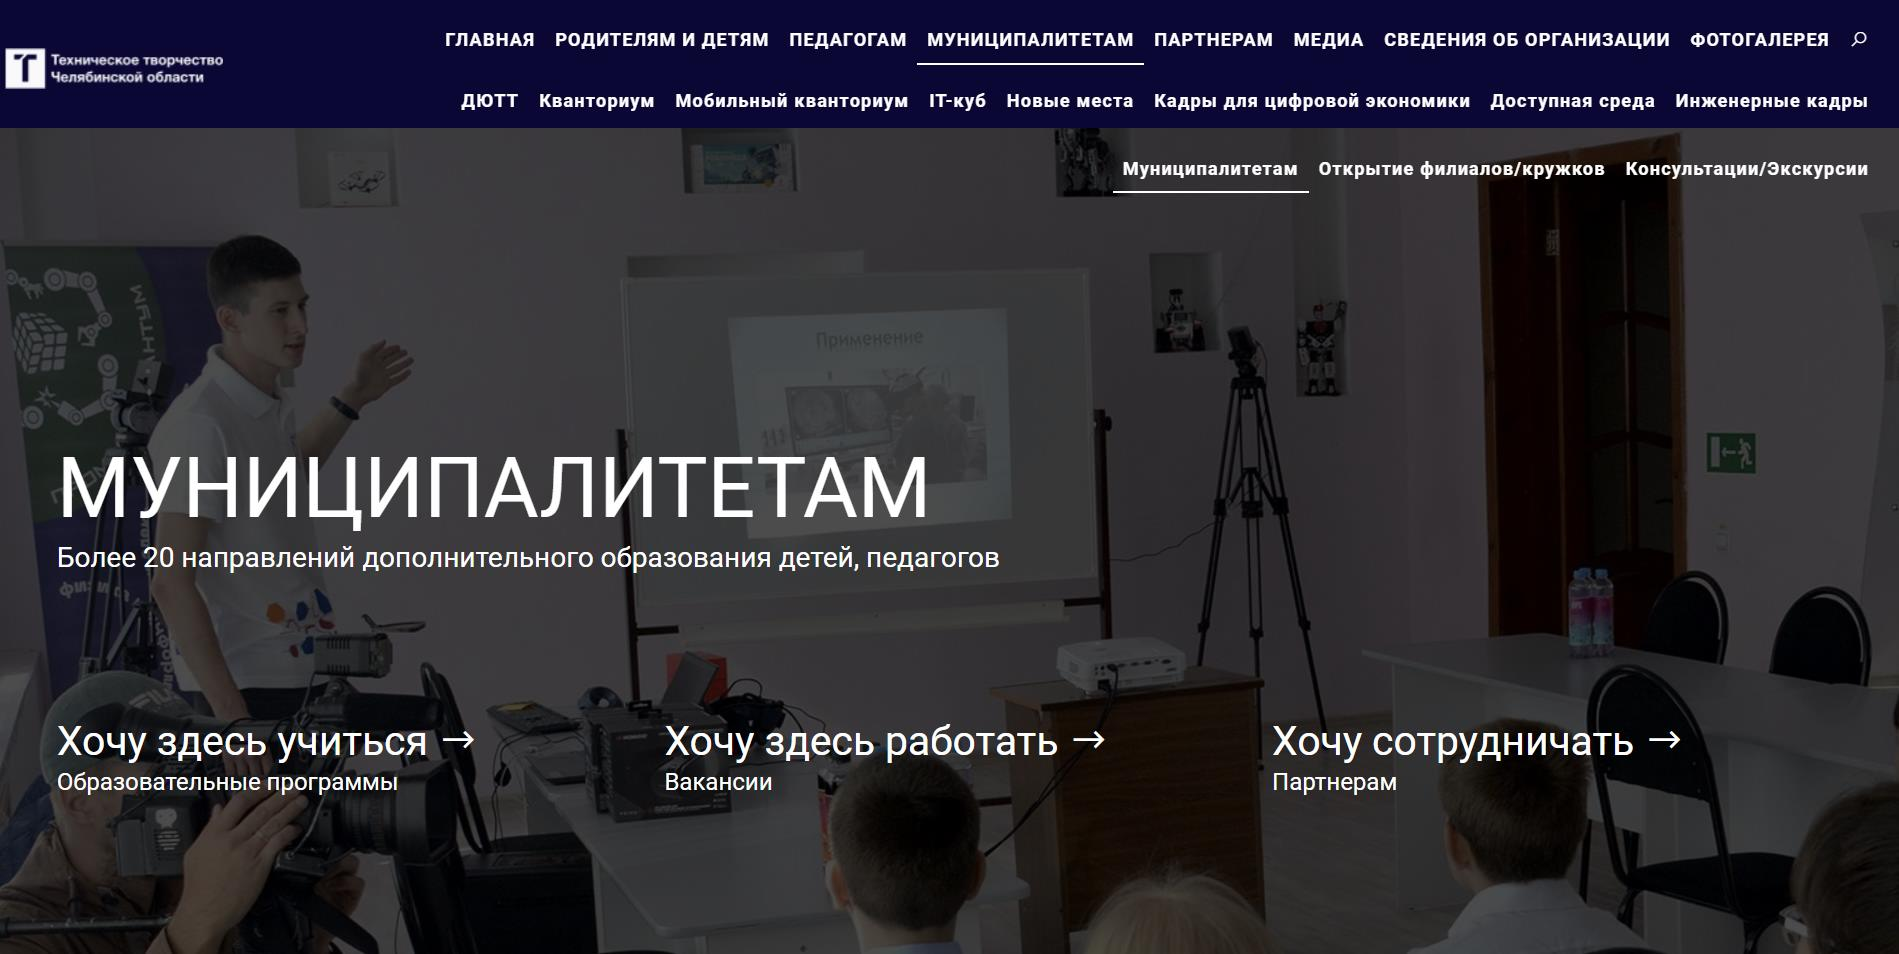 Сайт муниципалитетам